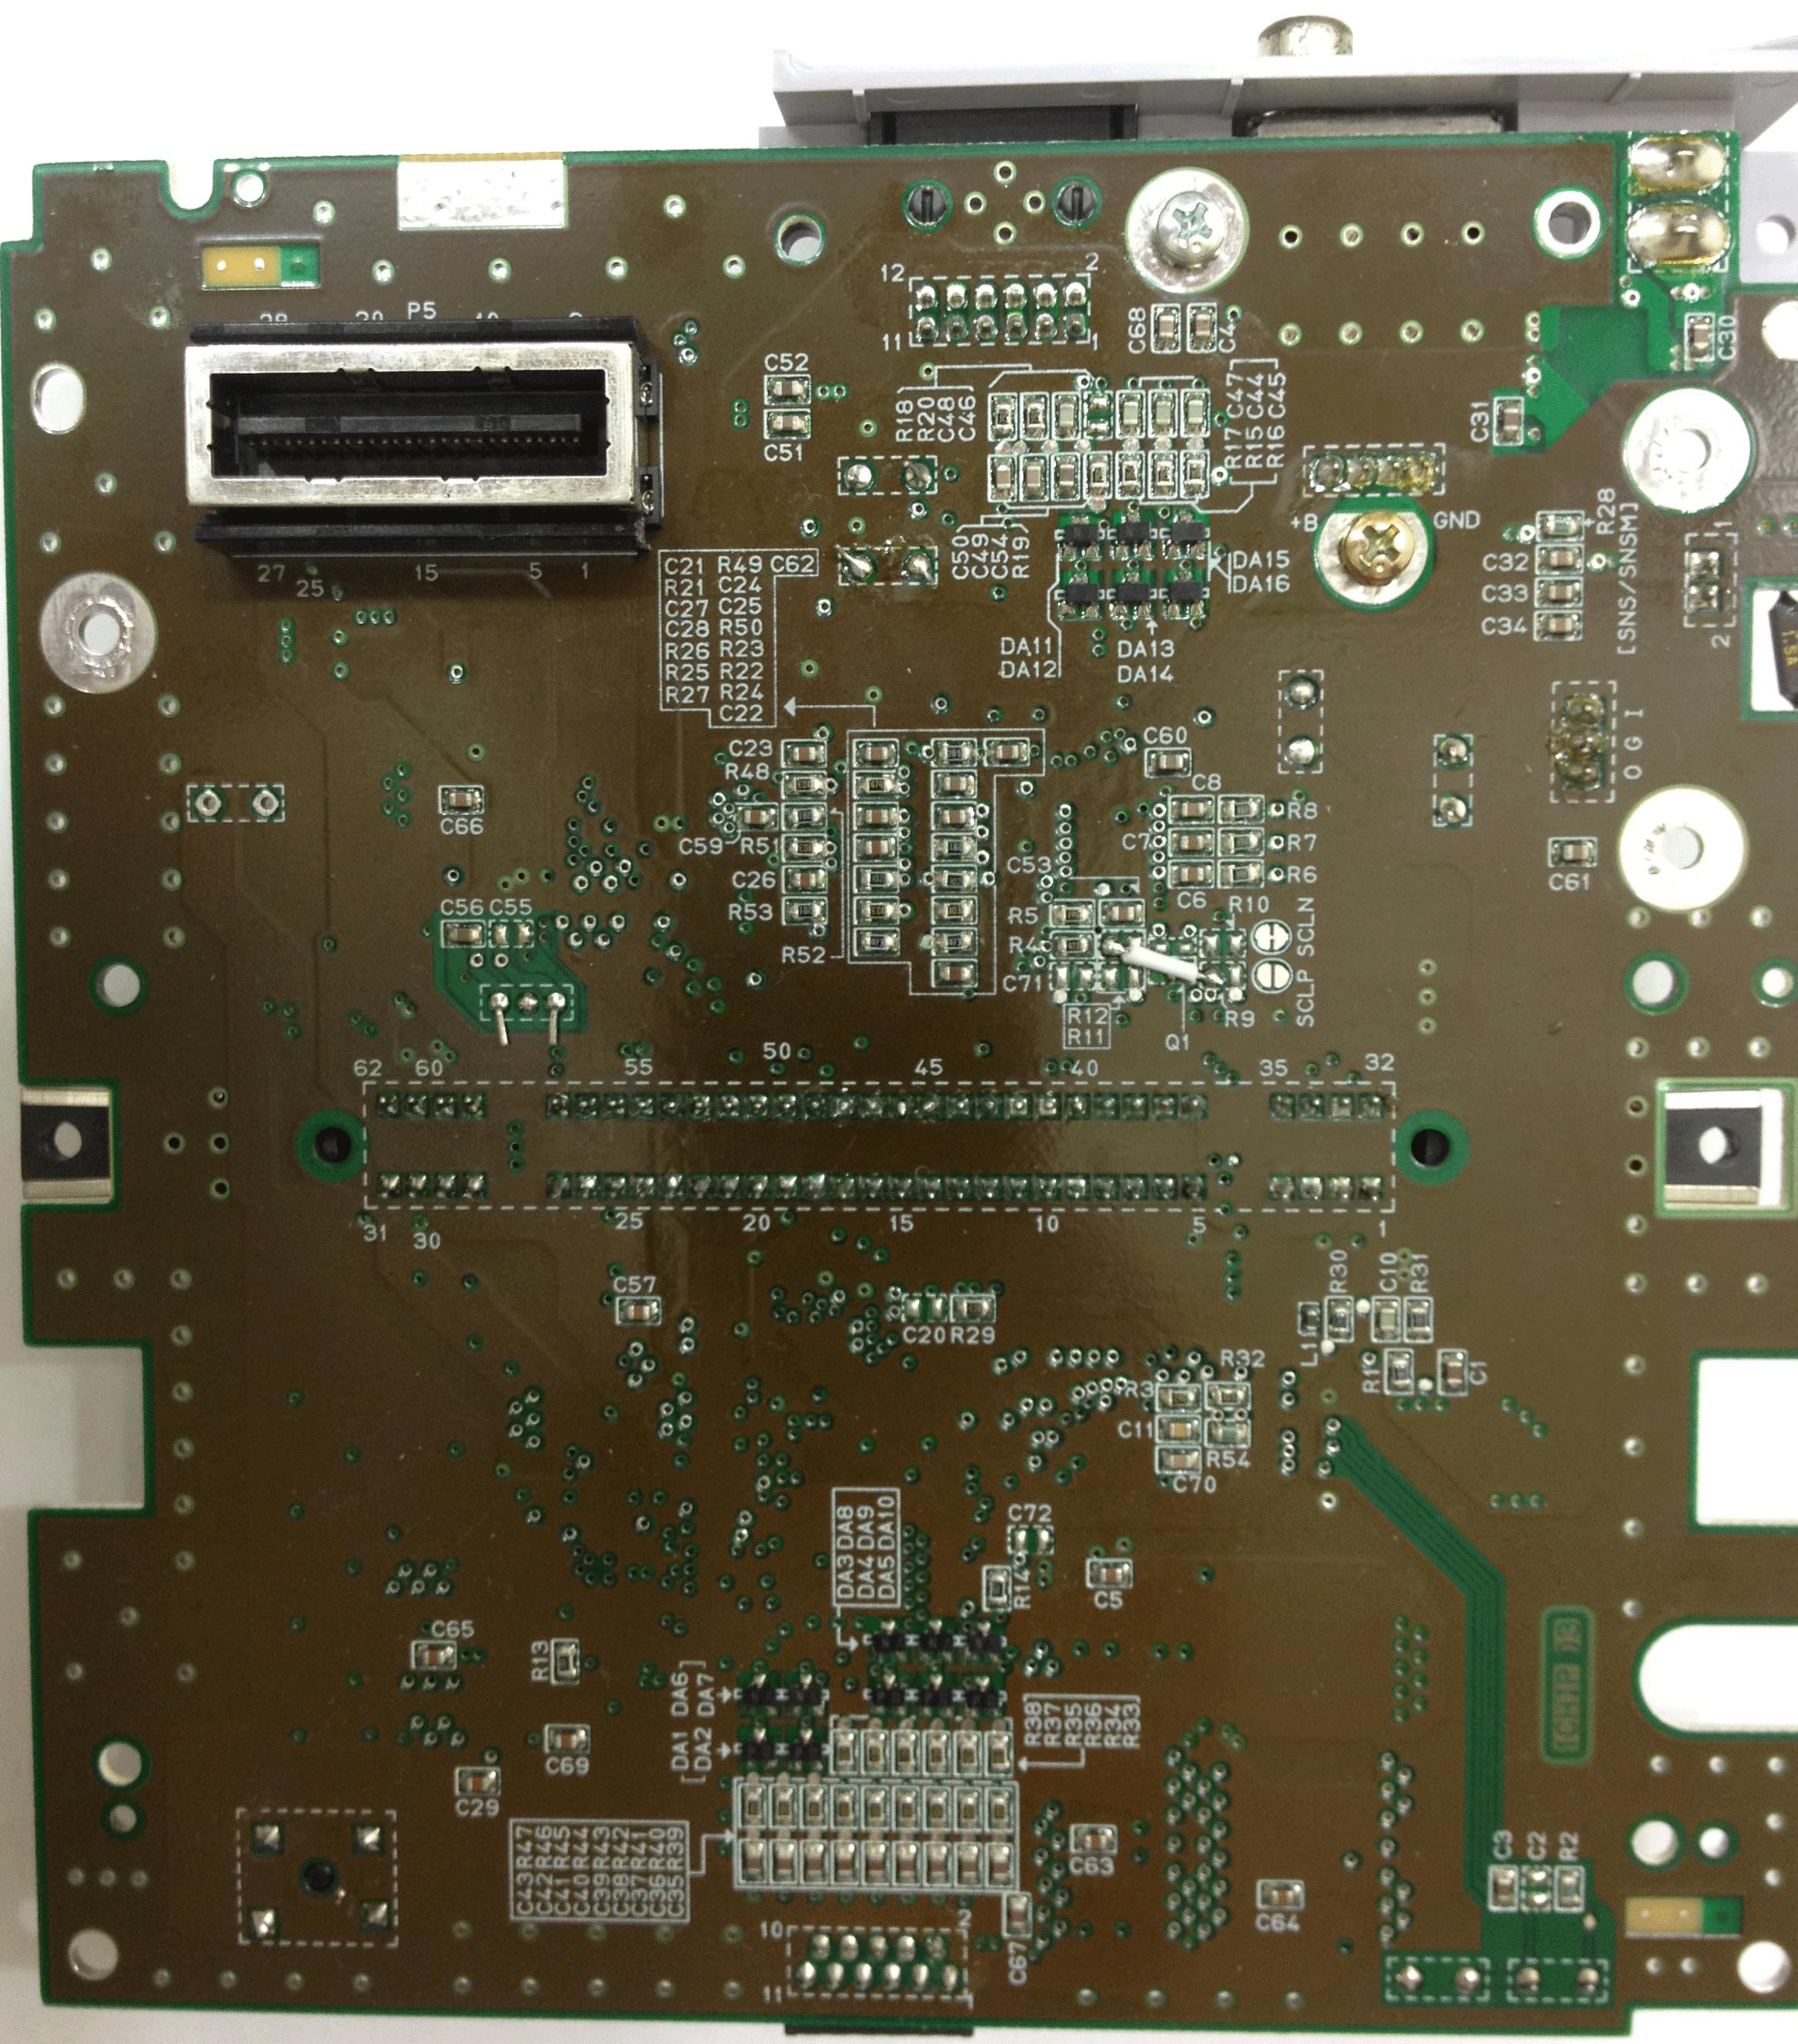 shmups system11 org • View topic - CSYNC mod for Super Famicom 1CHIP-03